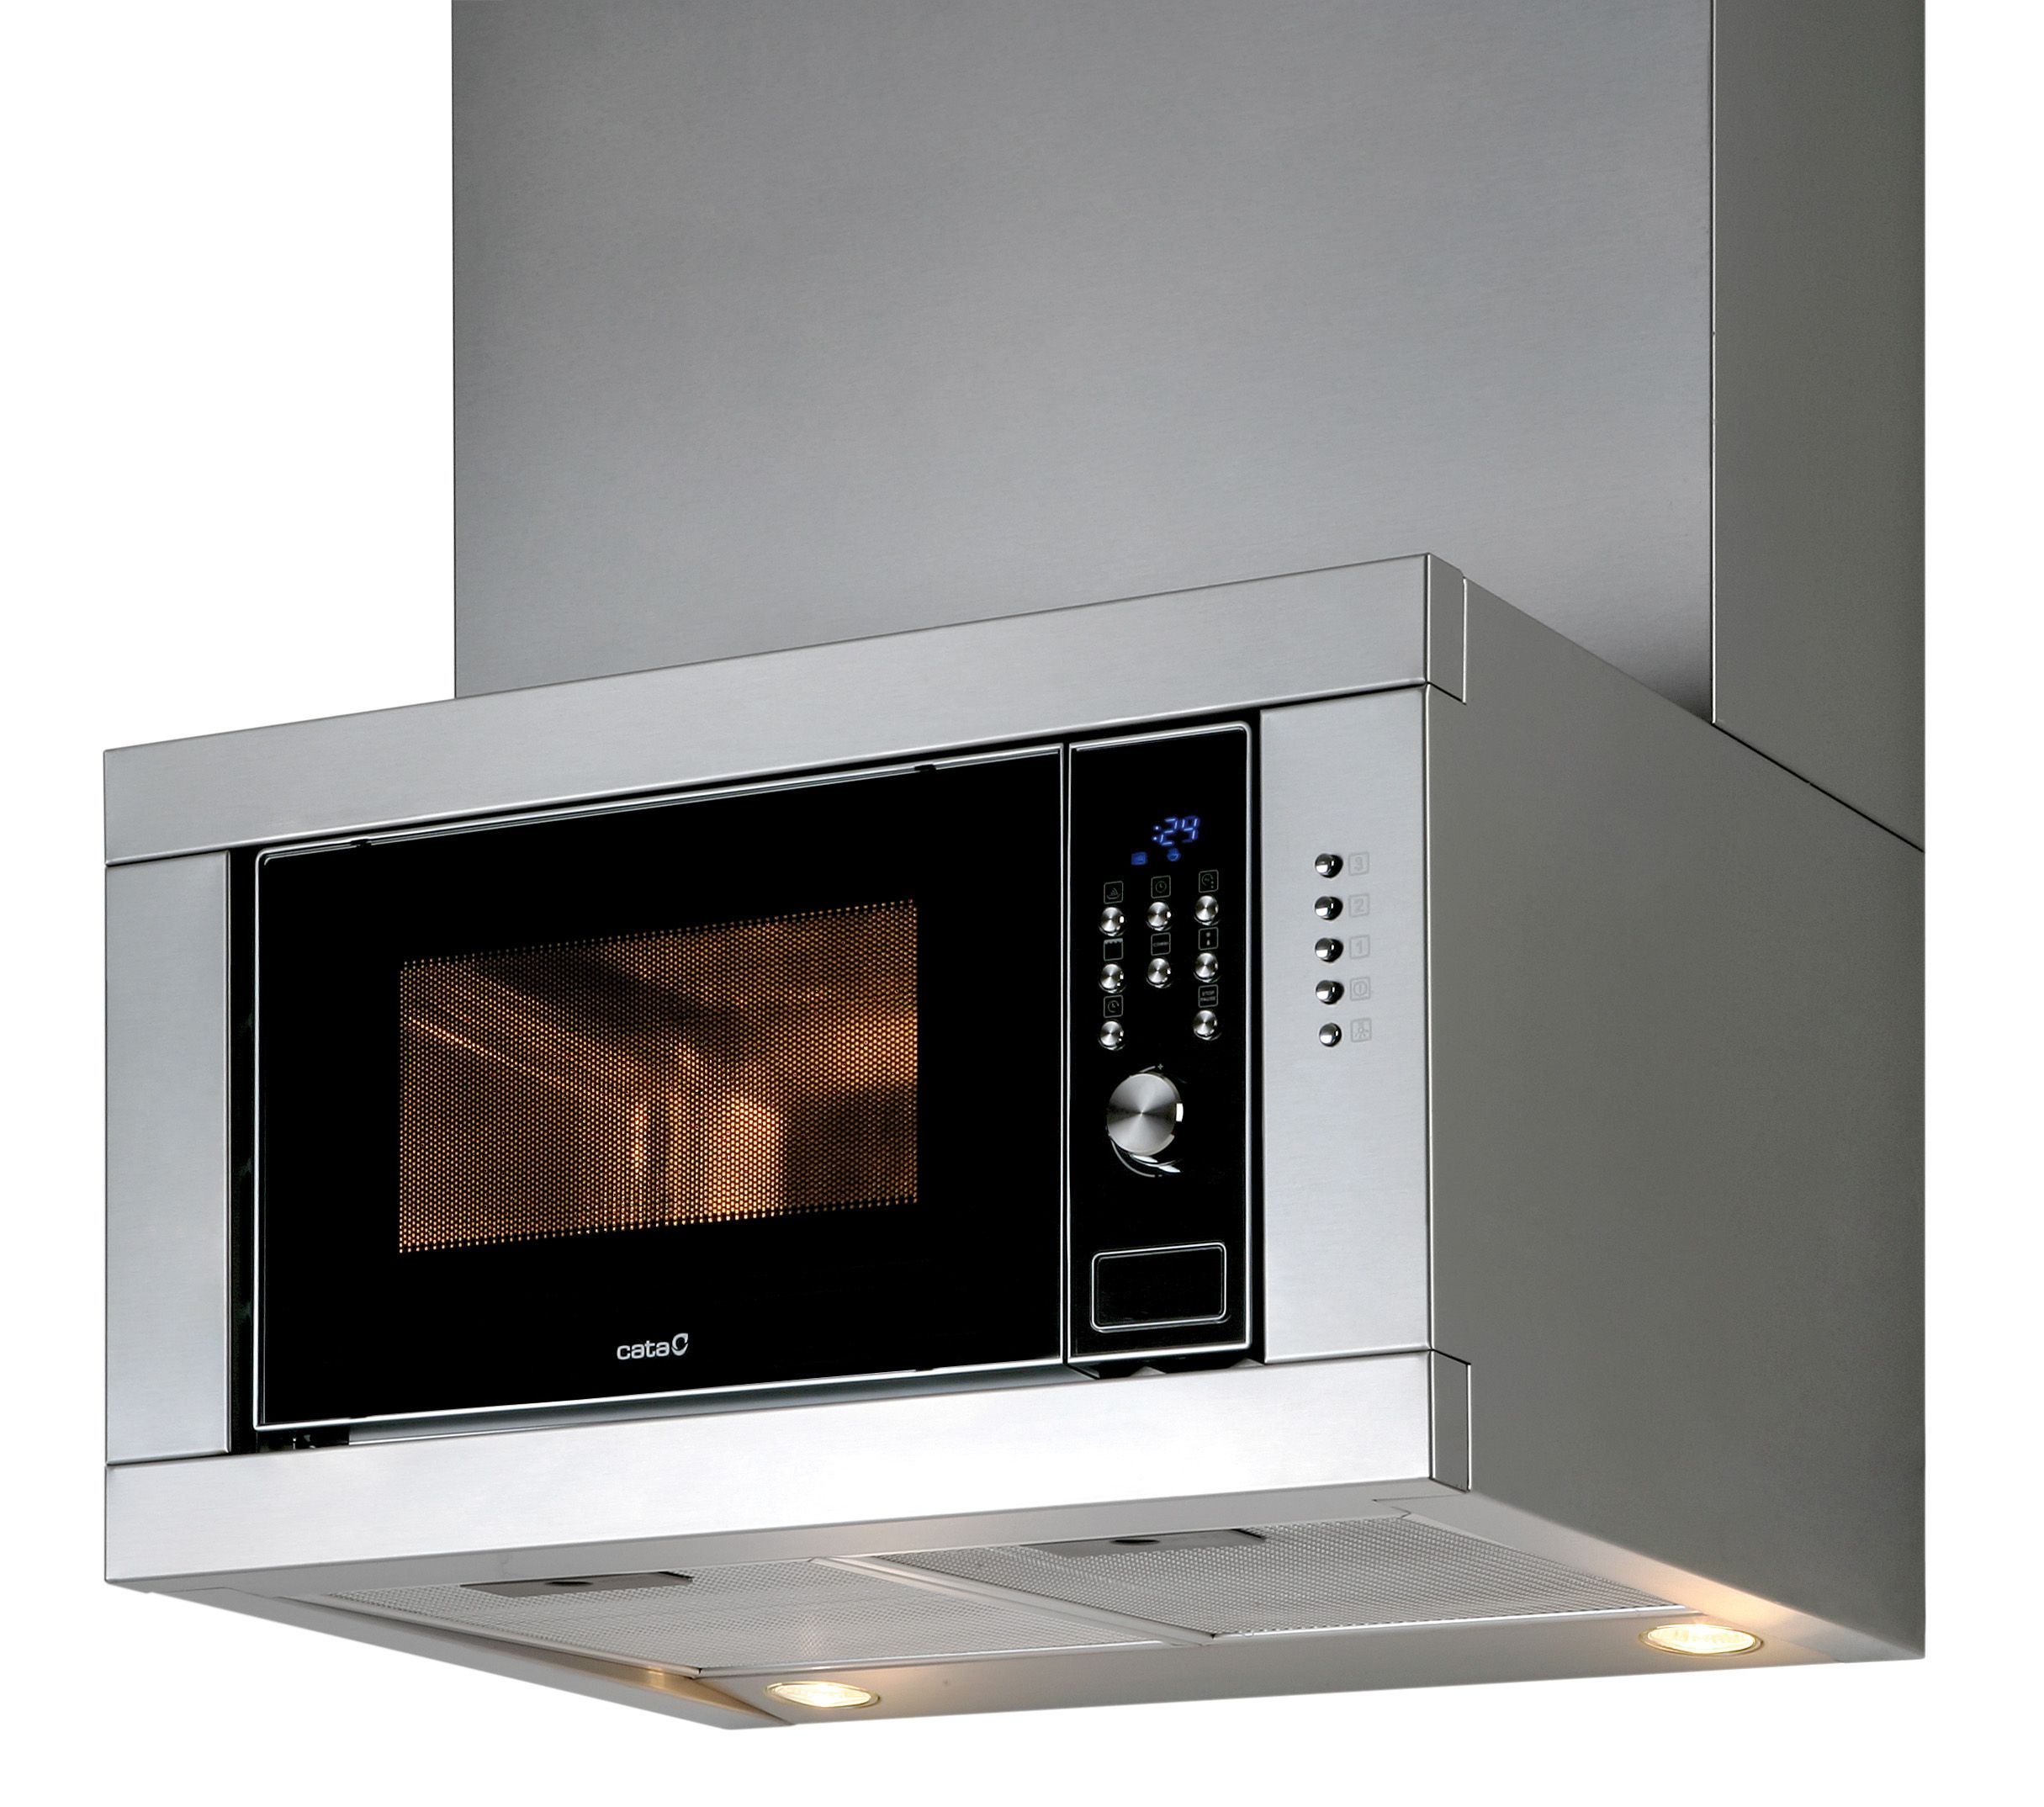 Campana Extractora Con Microondas Integrado Buen Invento Campana Kitchen Kitchen Appliances